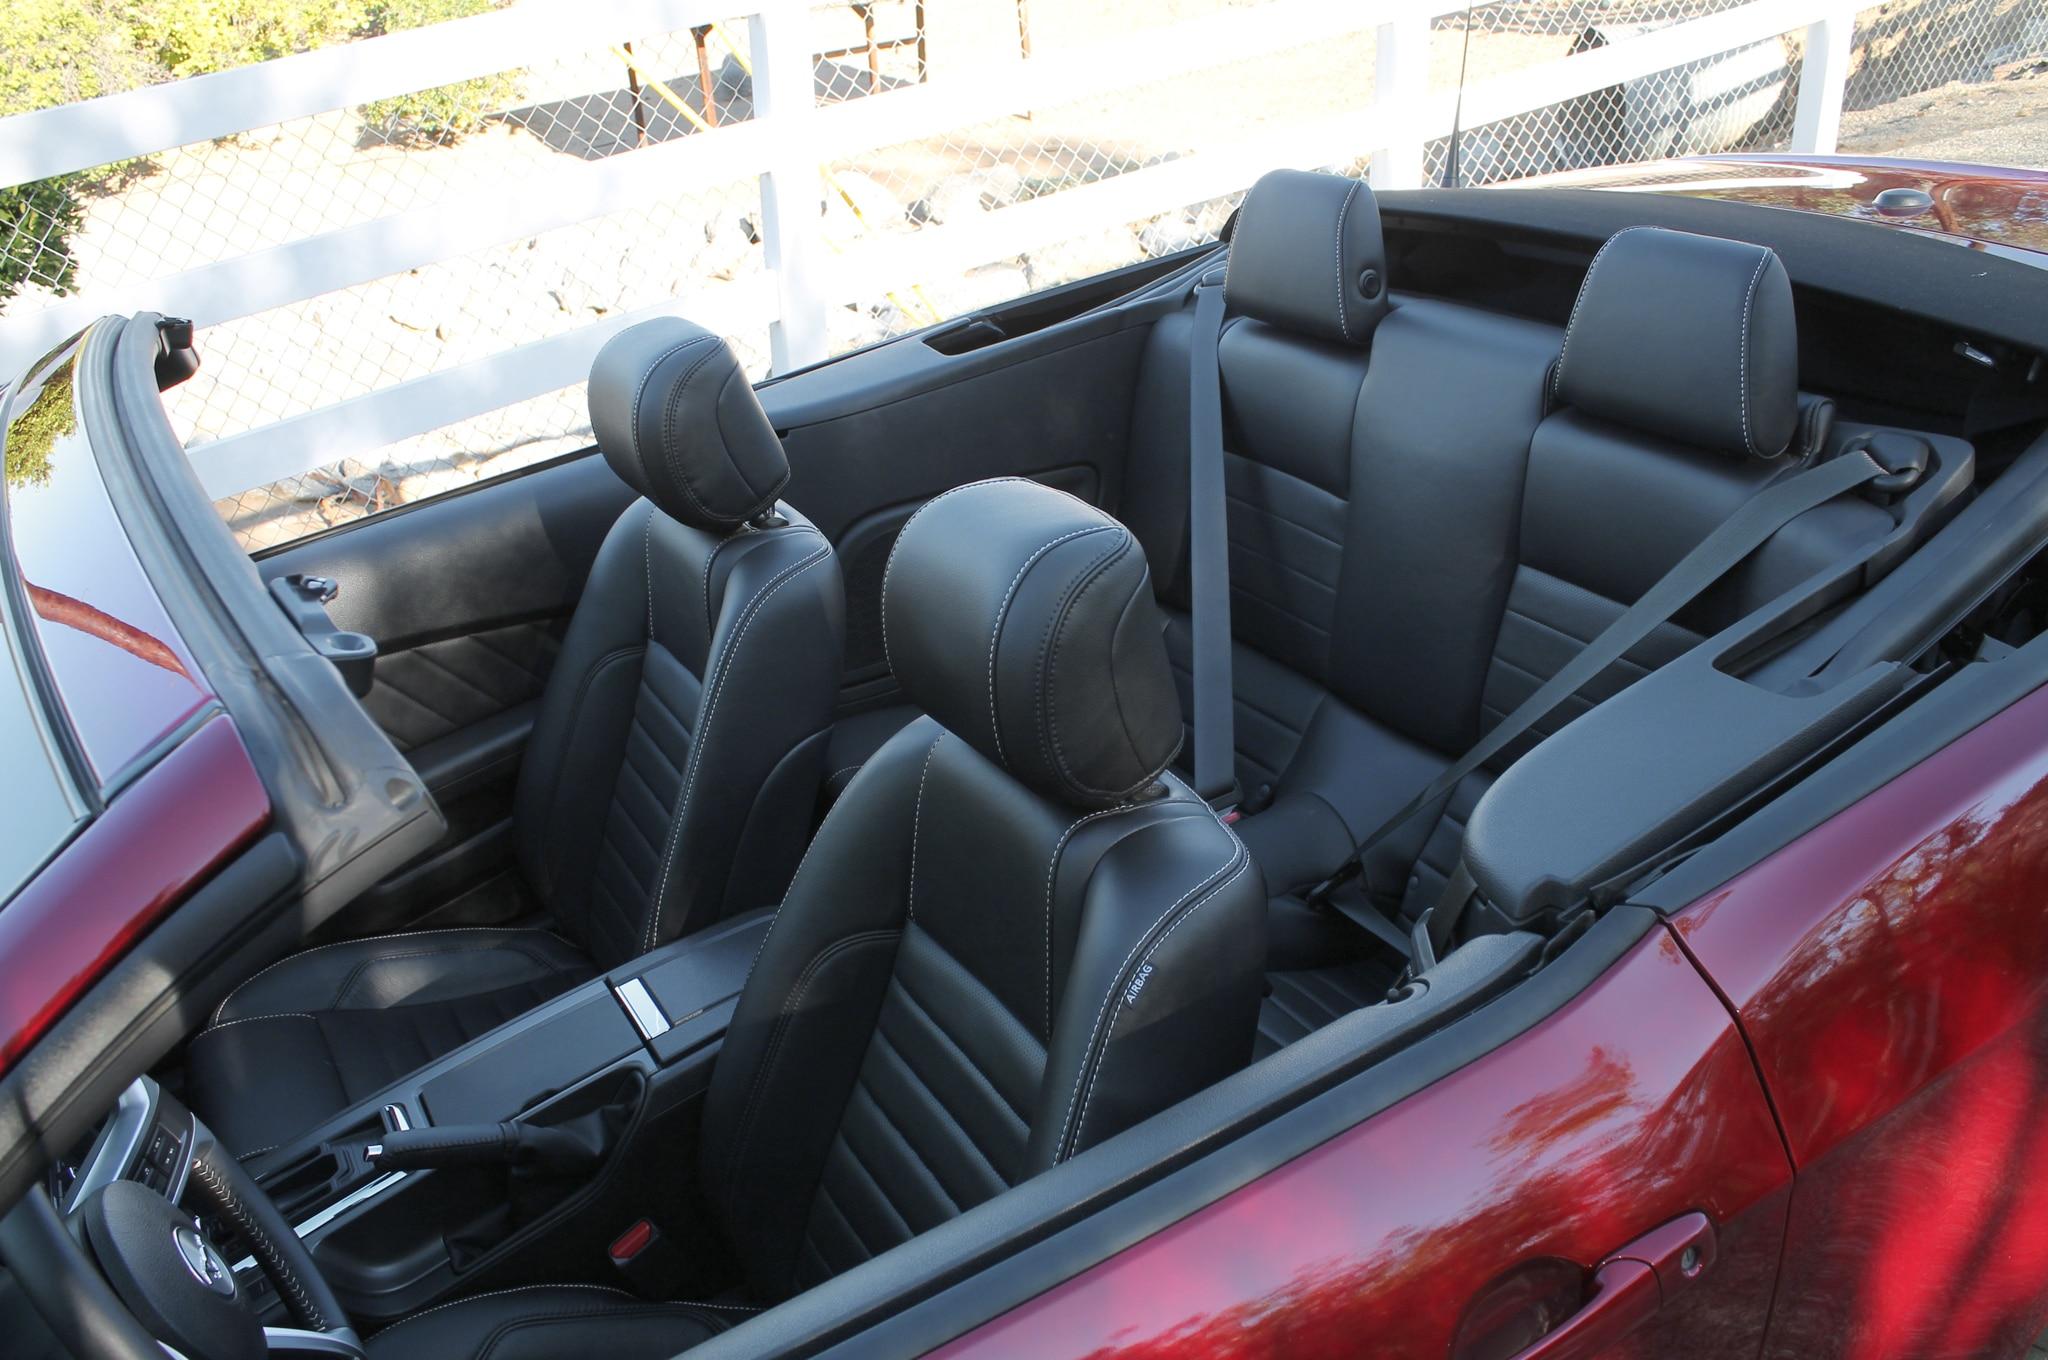 2014 ford mustang v8 convertible